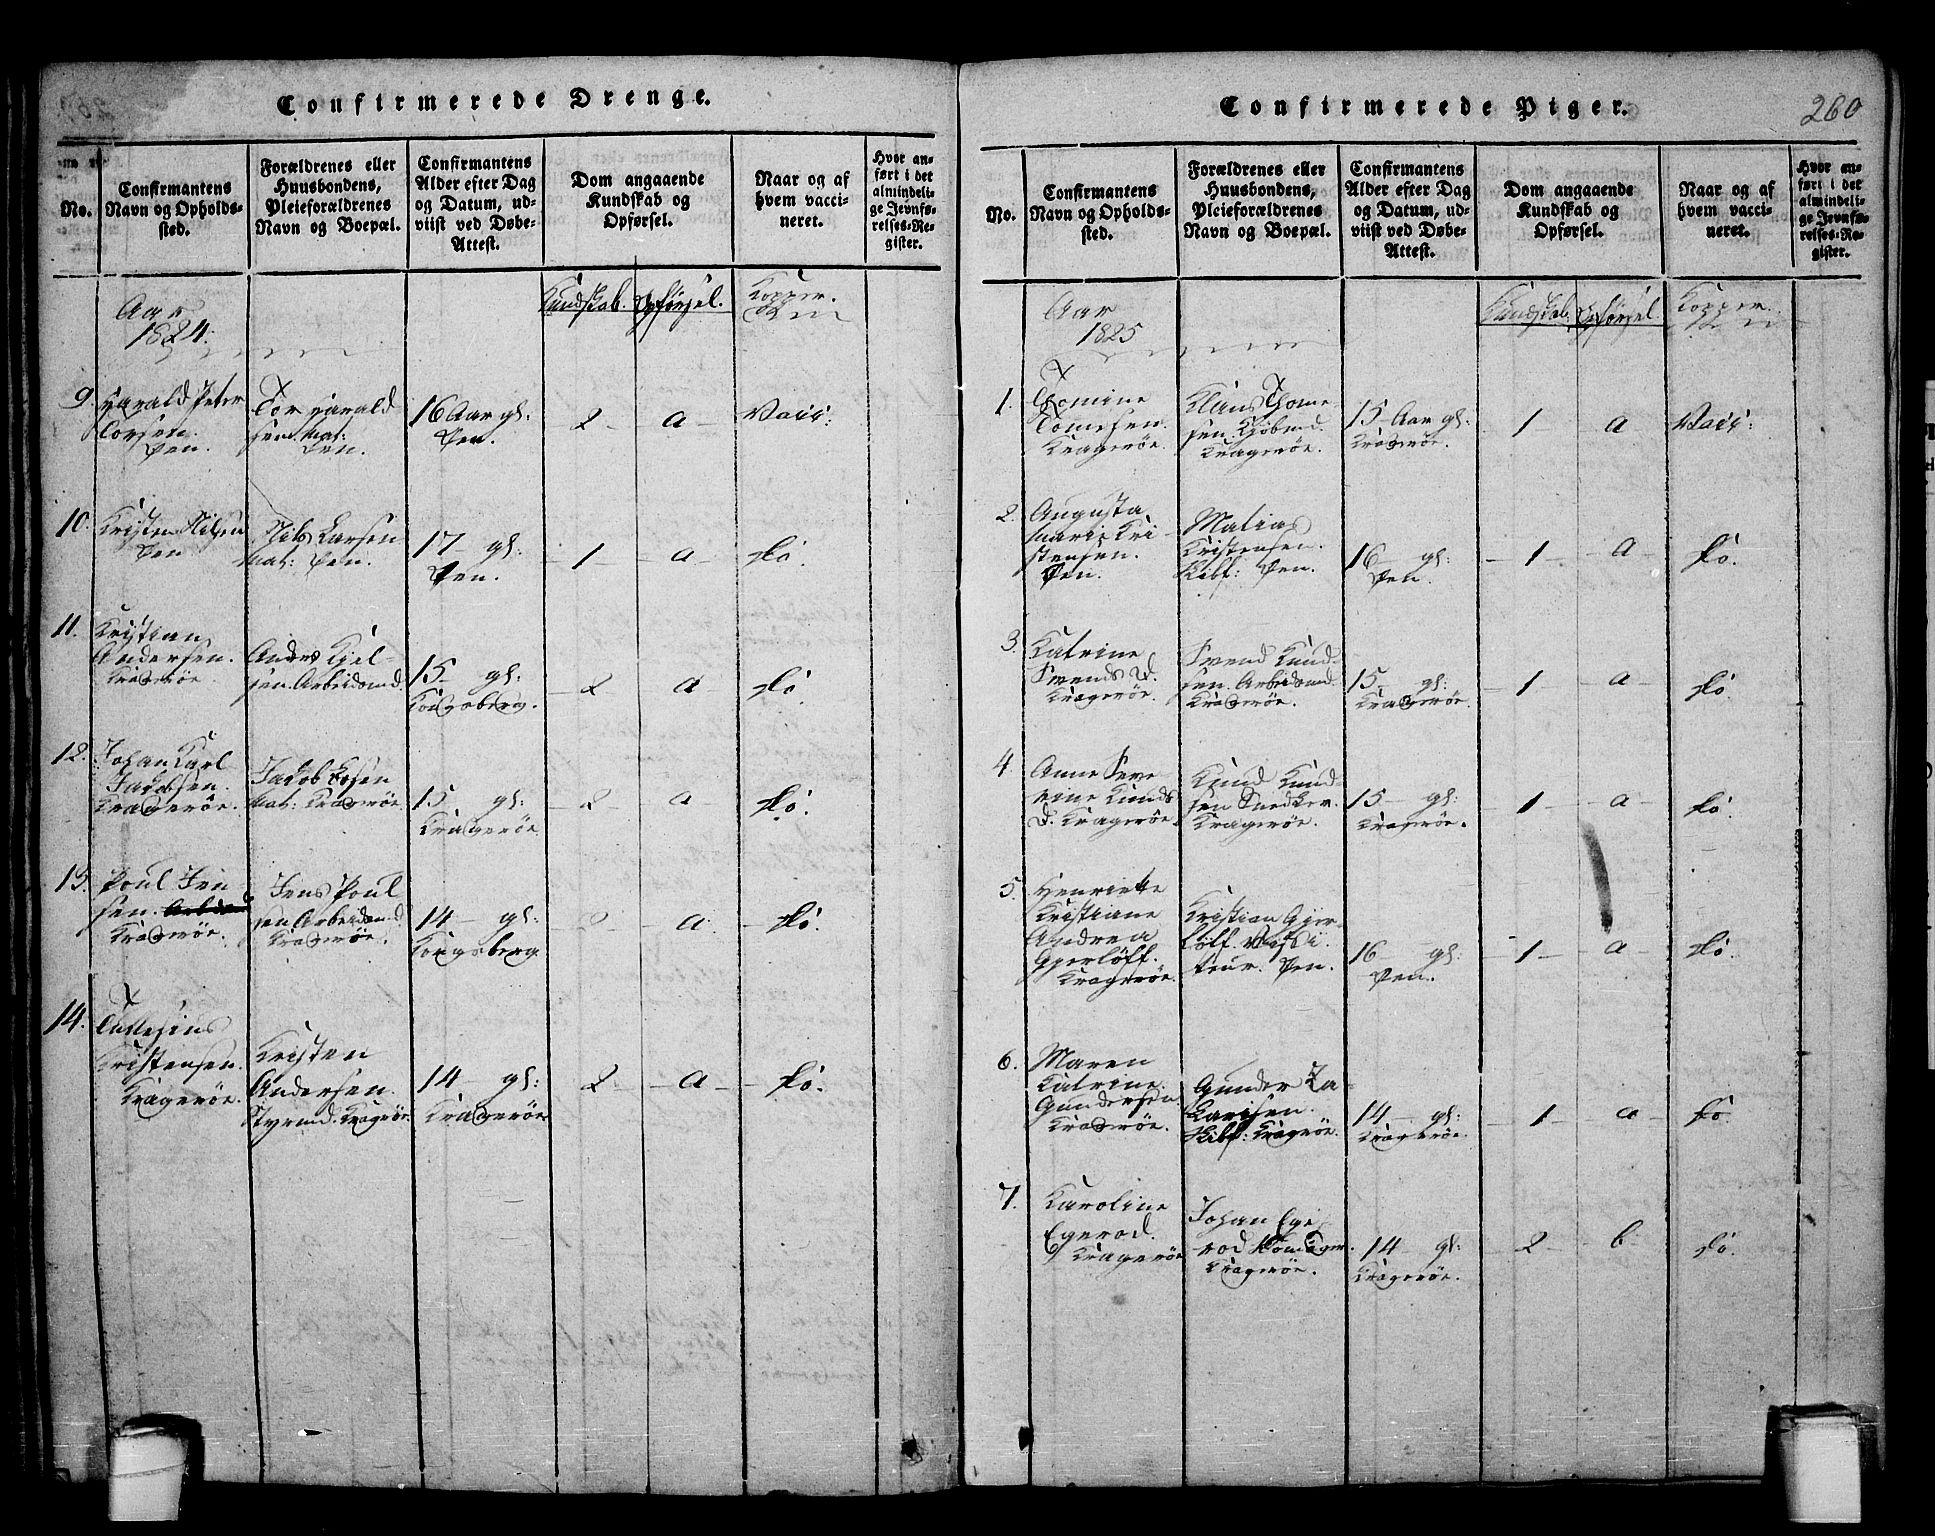 SAKO, Kragerø kirkebøker, F/Fa/L0004: Ministerialbok nr. 4, 1814-1831, s. 260